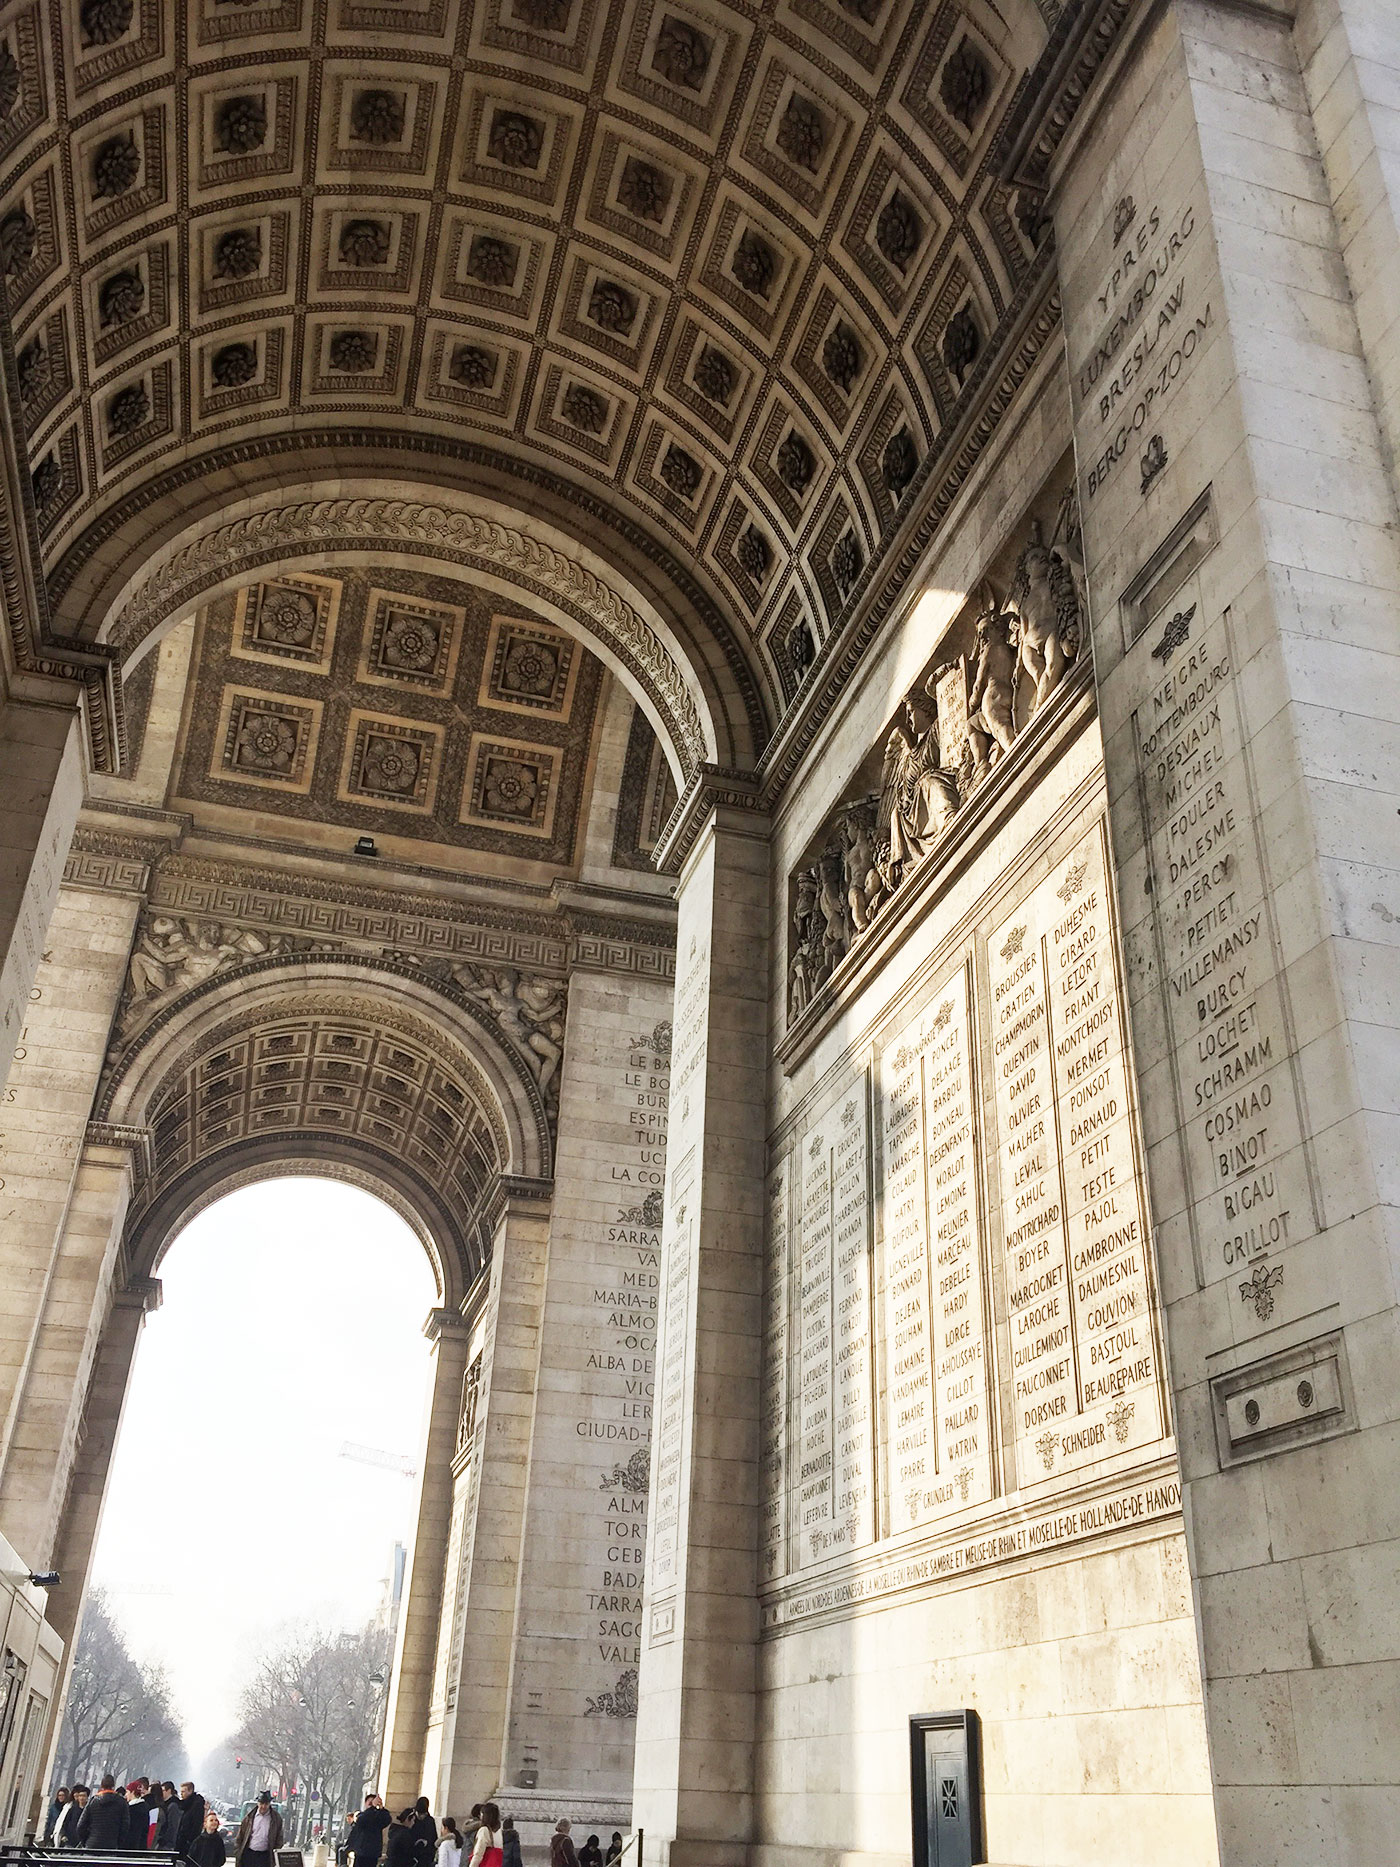 Triumfbuen-paris-frankrig-bygningsvaerk